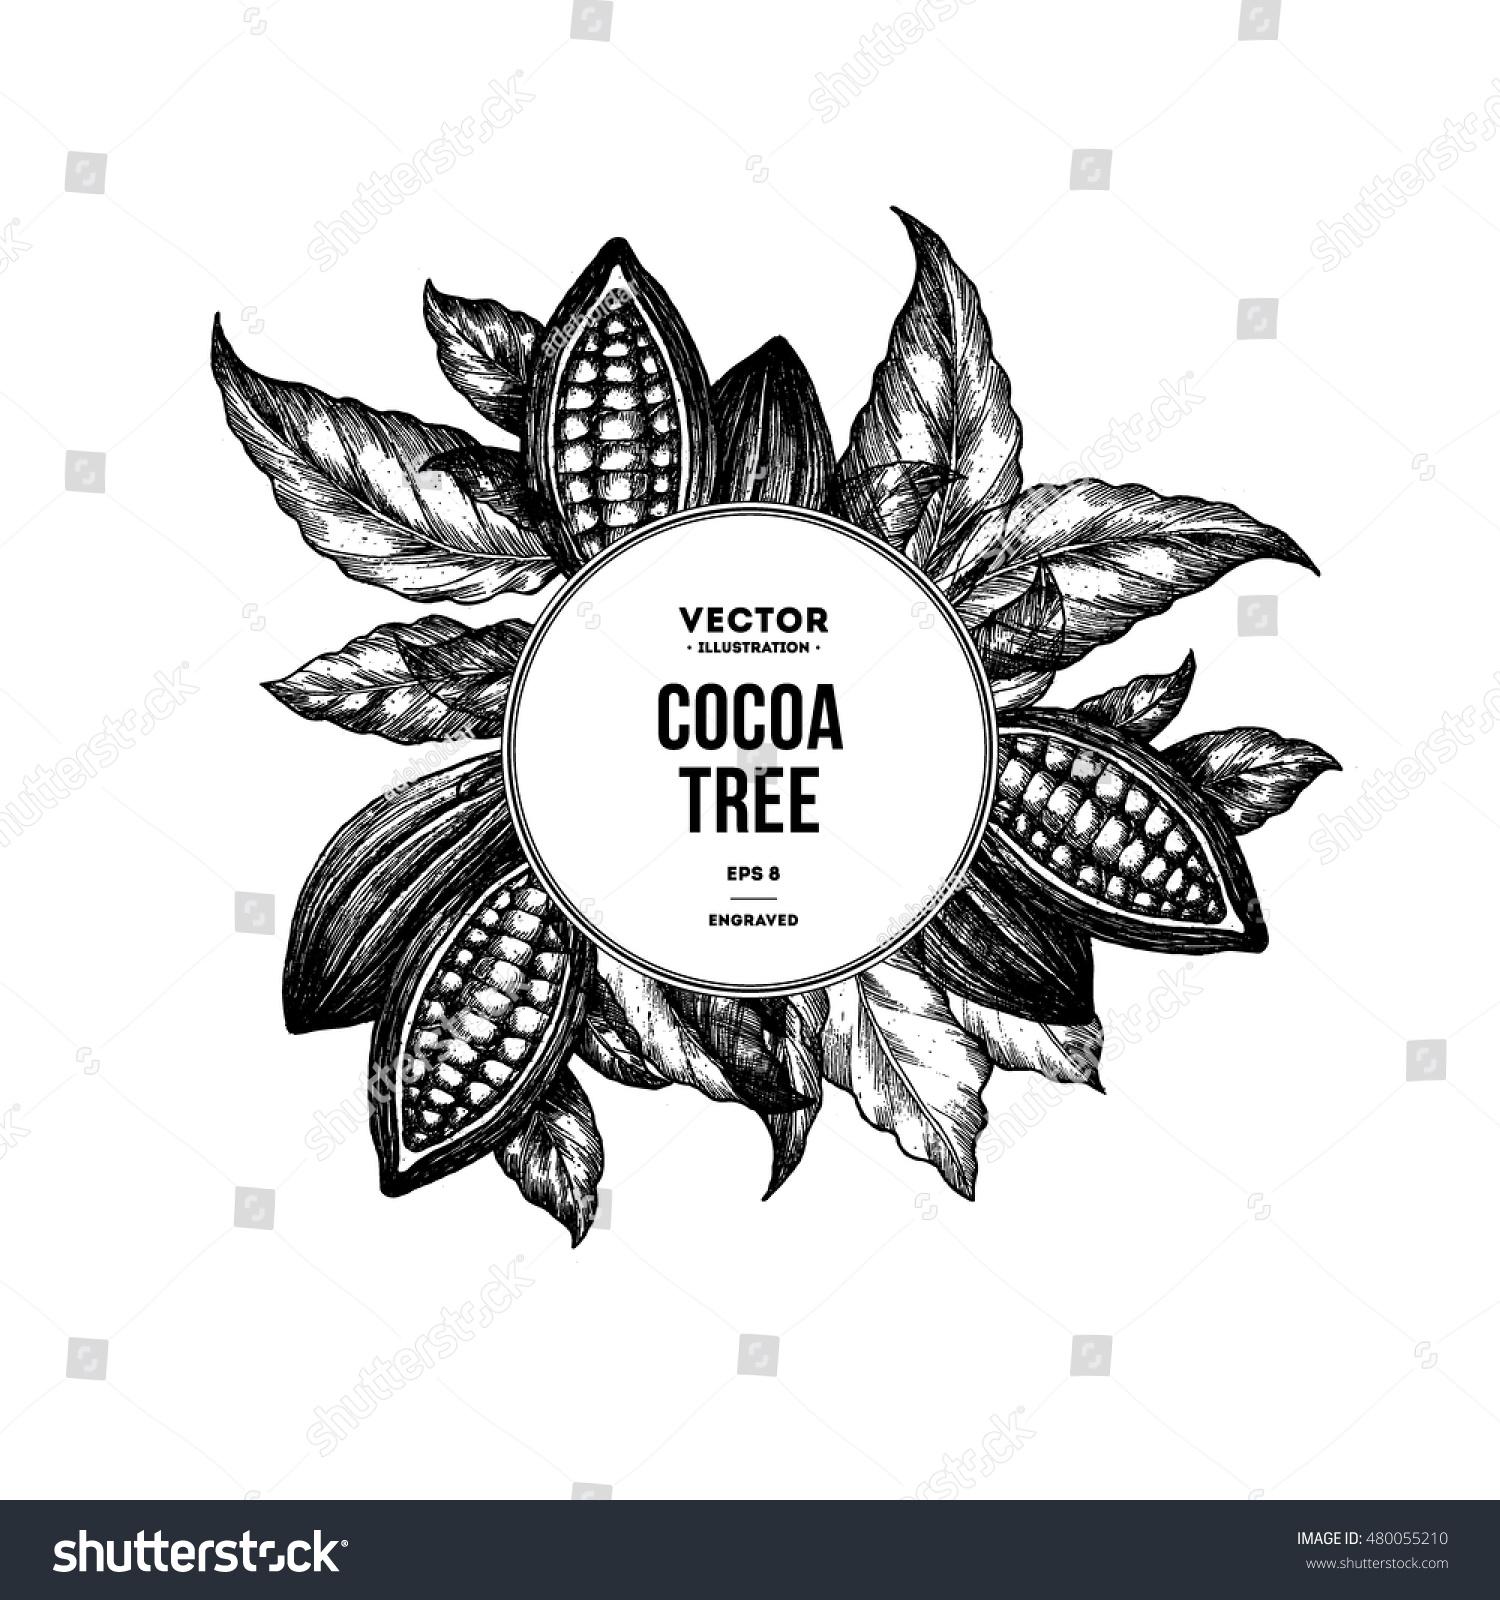 Cocoa Bean Tree Design Template Engraved Stock Vector (Royalty Free ...